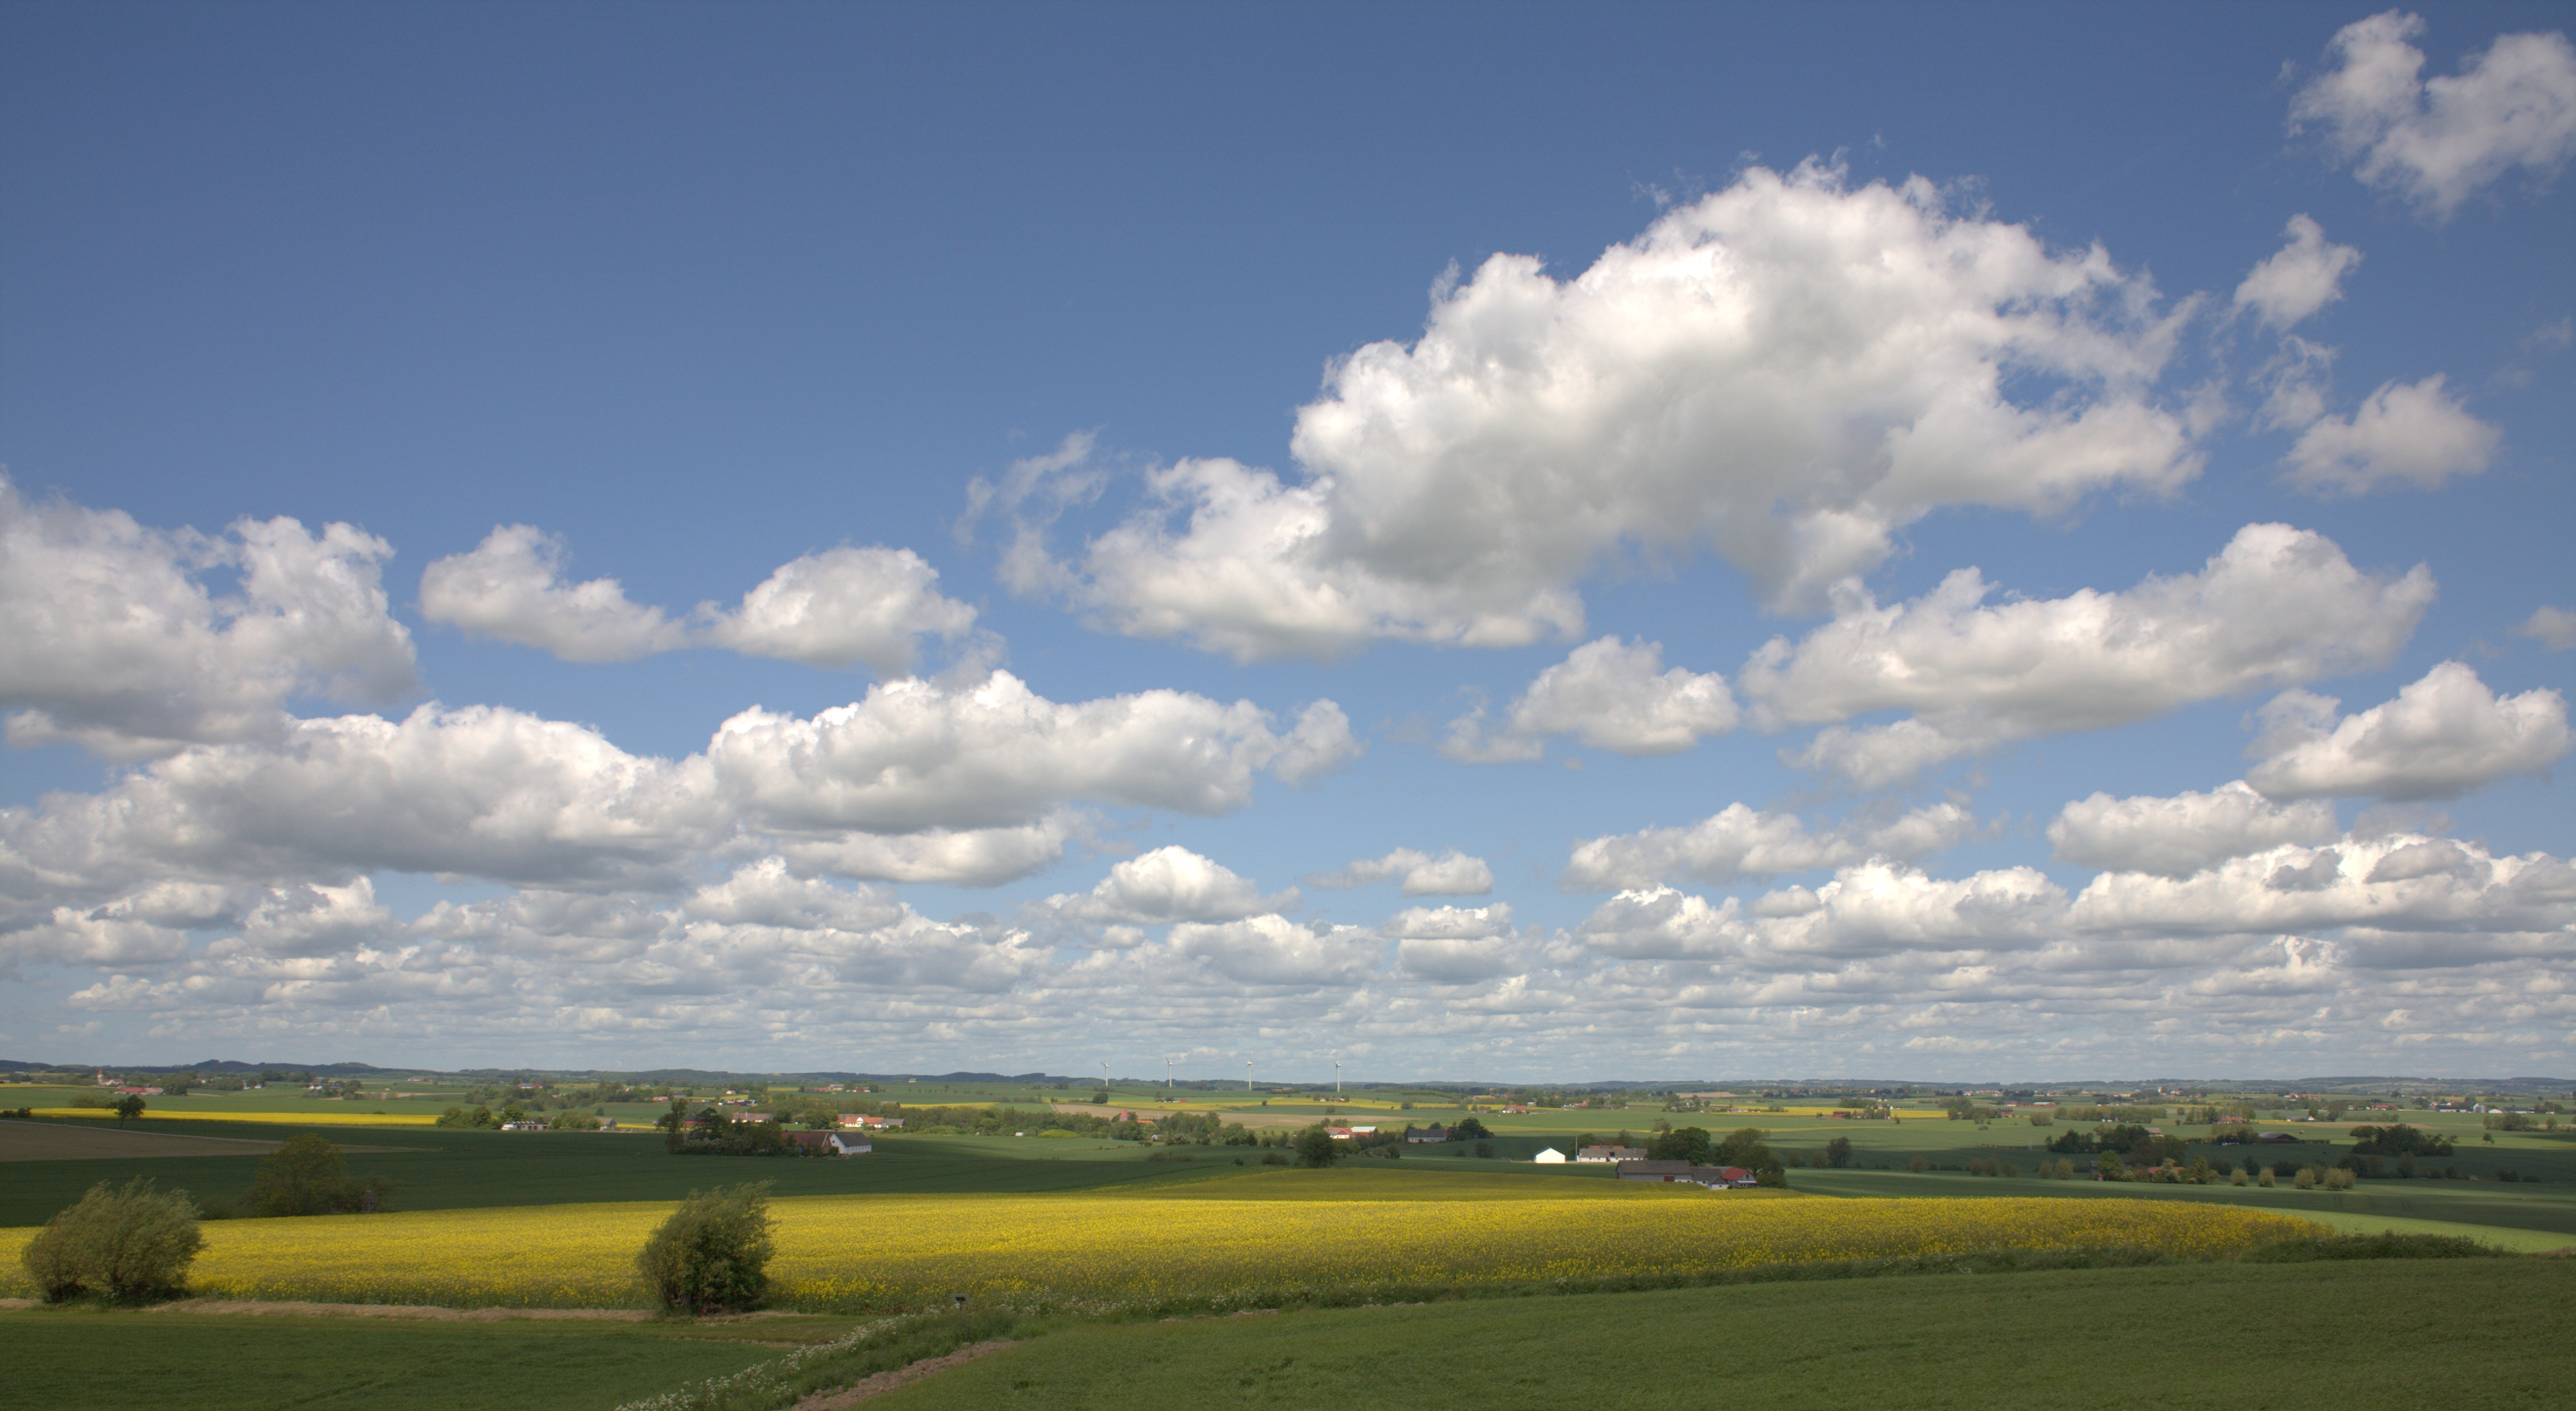 Sydkusten Skåne öppna landskap